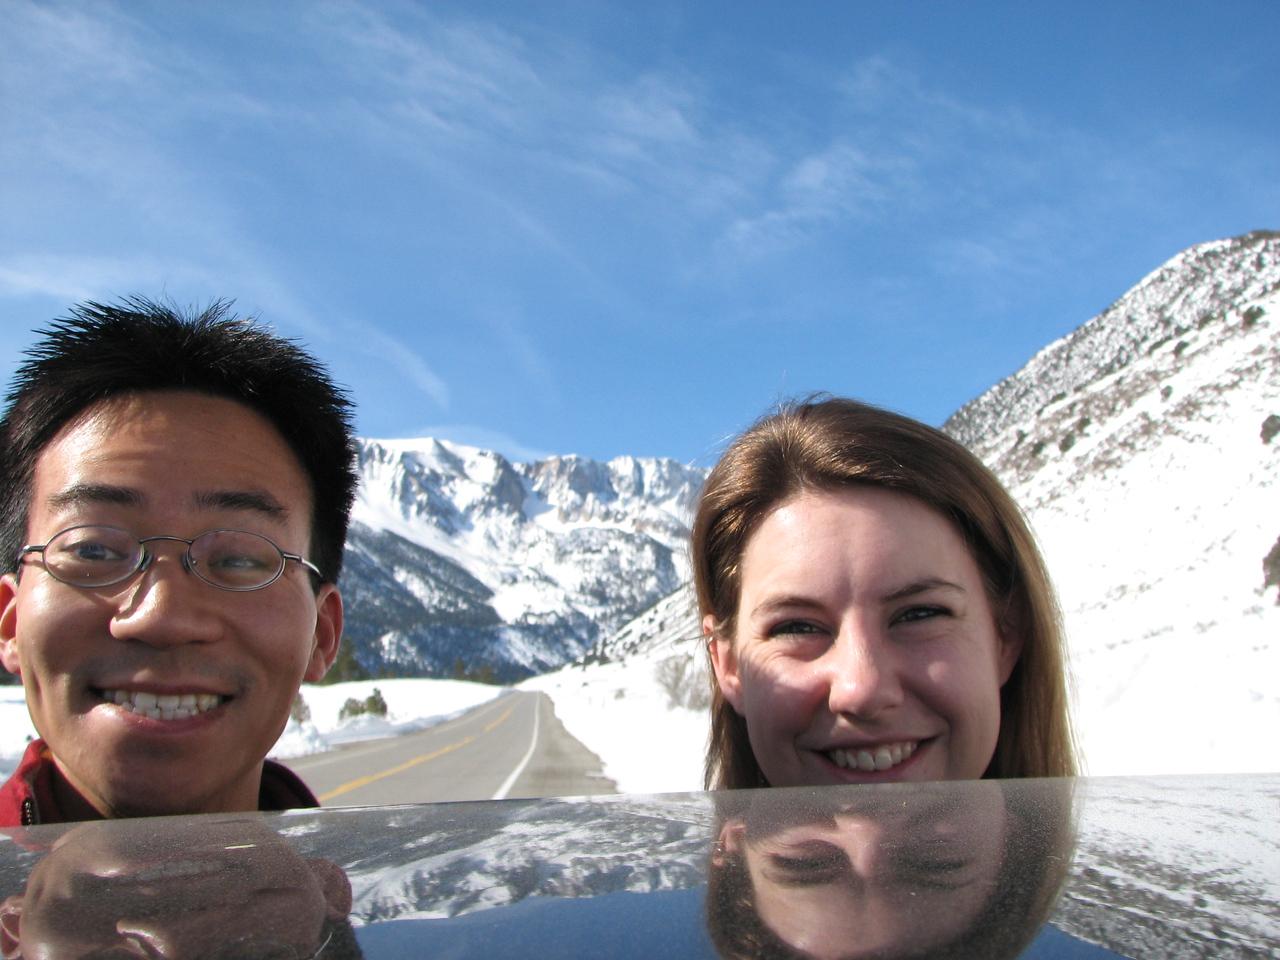 2008 02 10 Sun - Yosemite from Rt 120 just before road closure plus 2 floating heads - Ben Yu & Lori Fulton